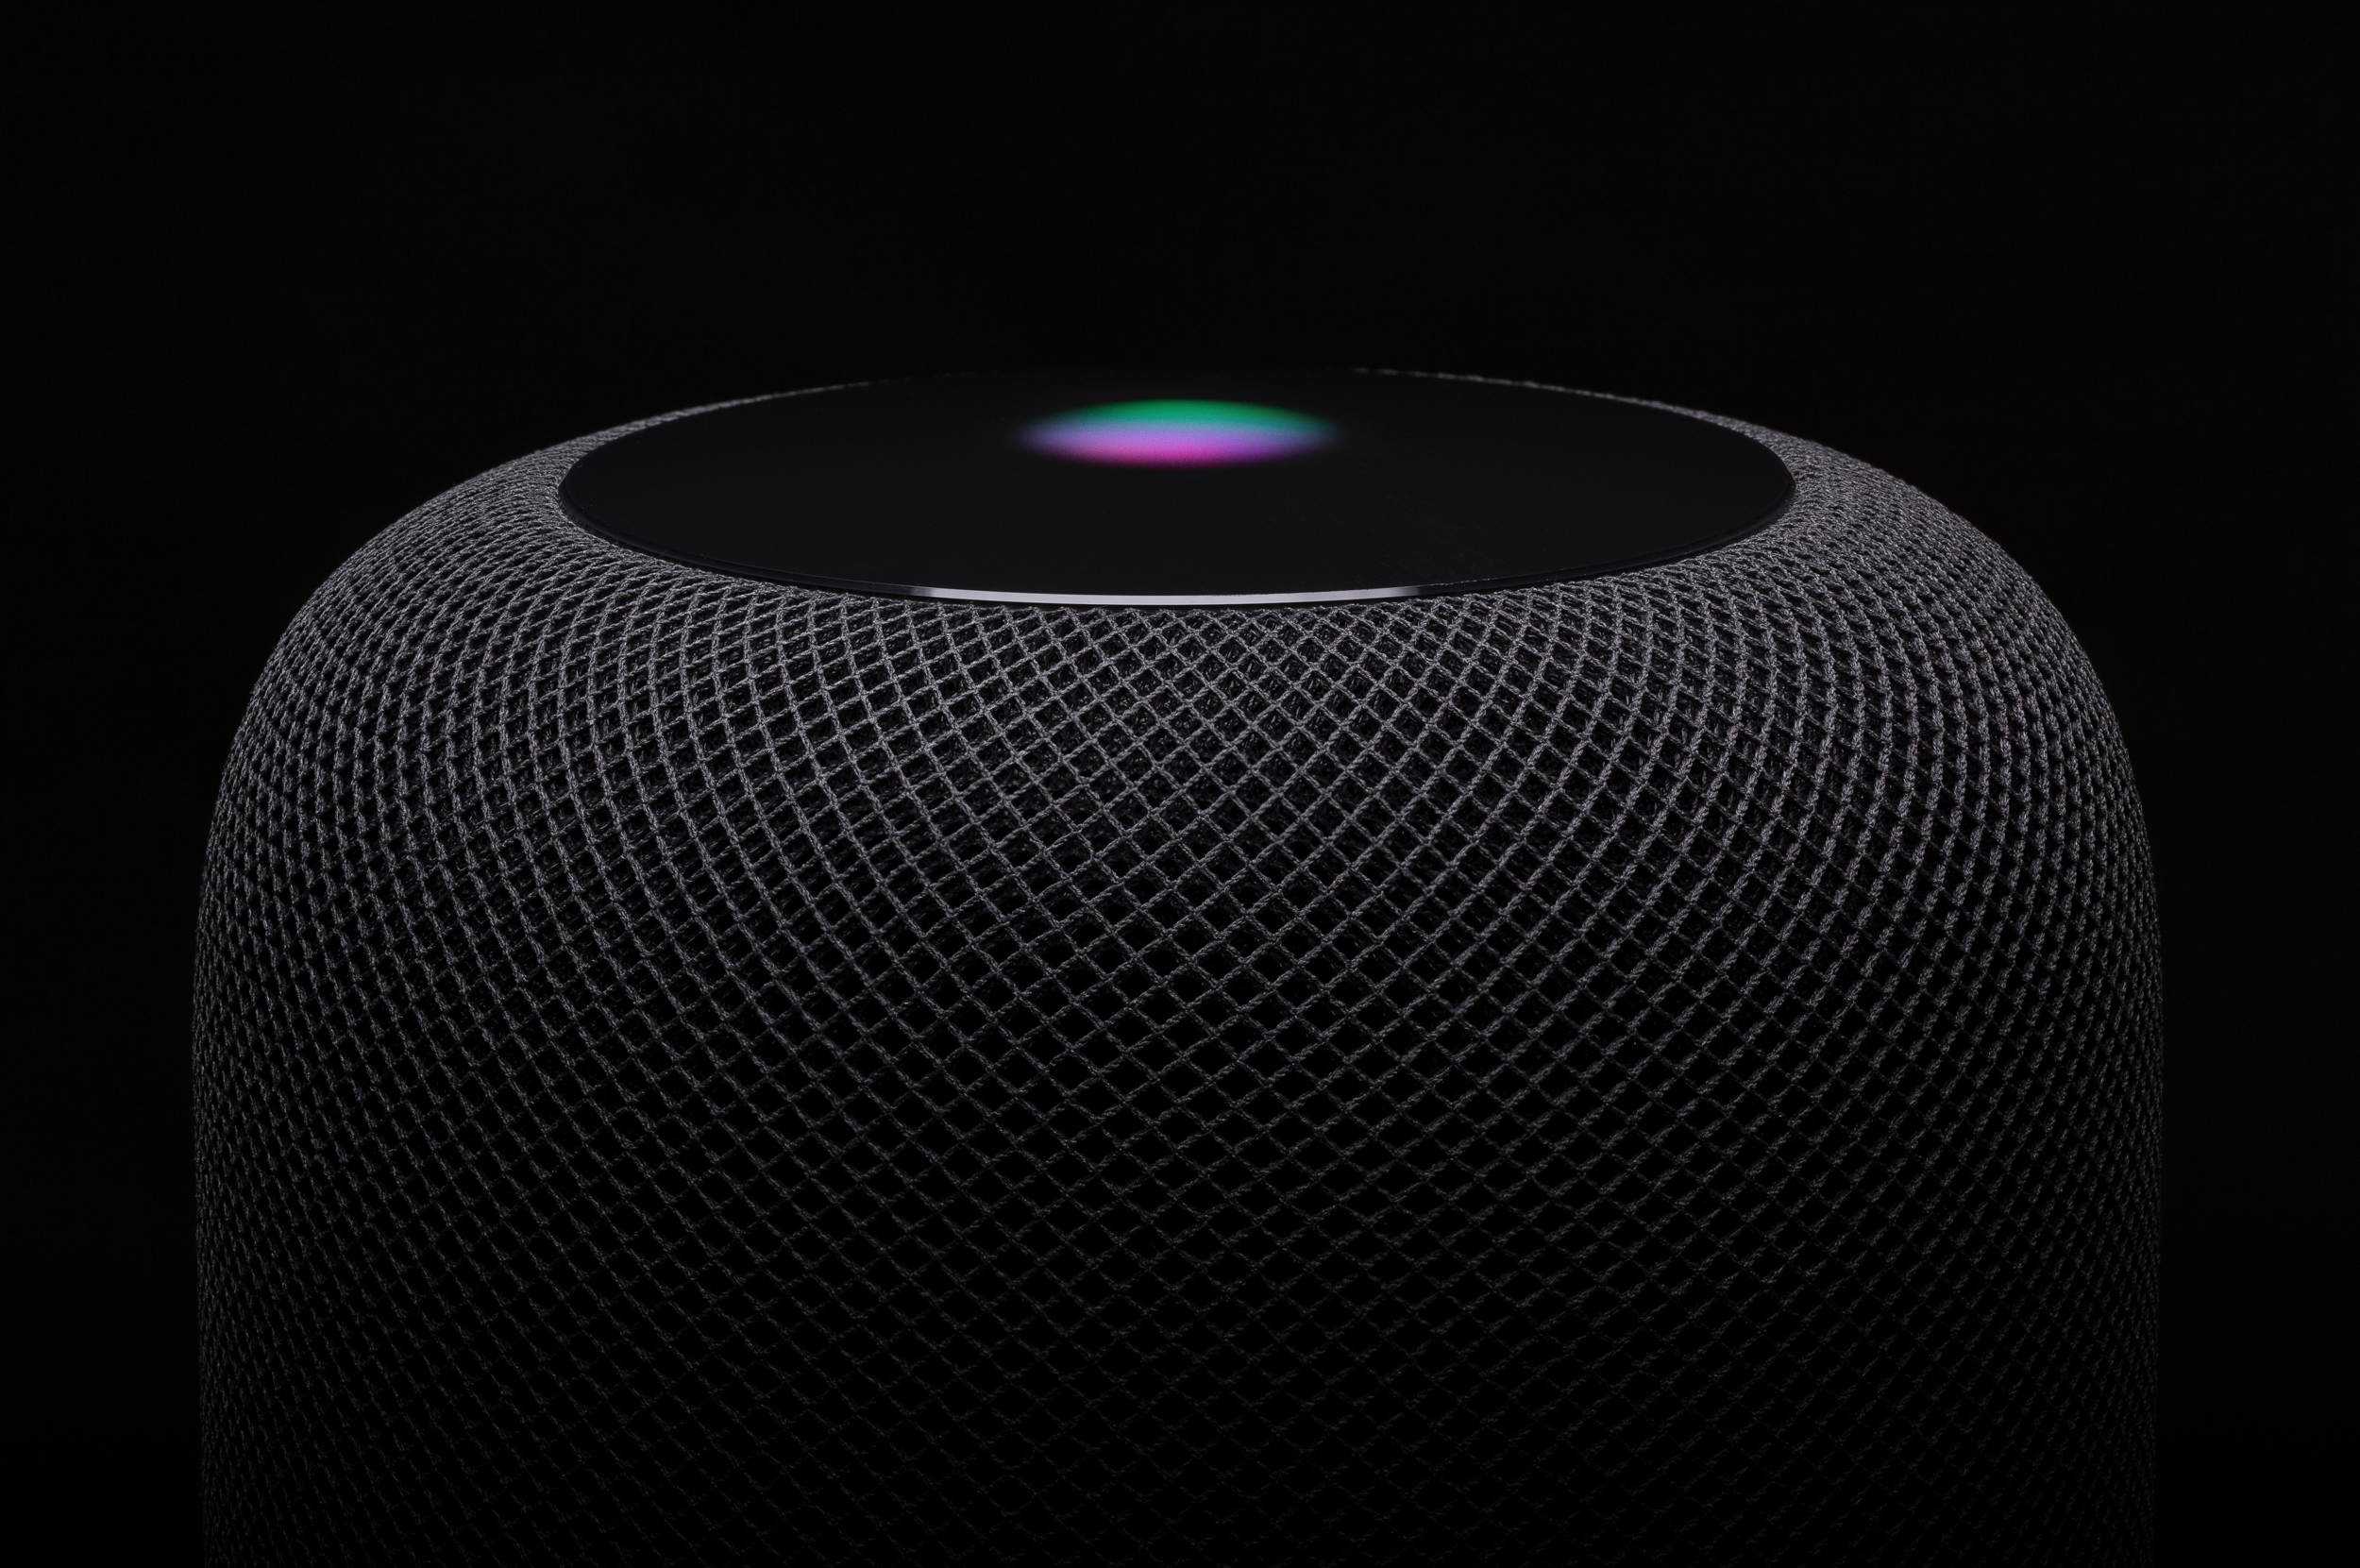 apple-homepod-product-hero-2-colour.jpg